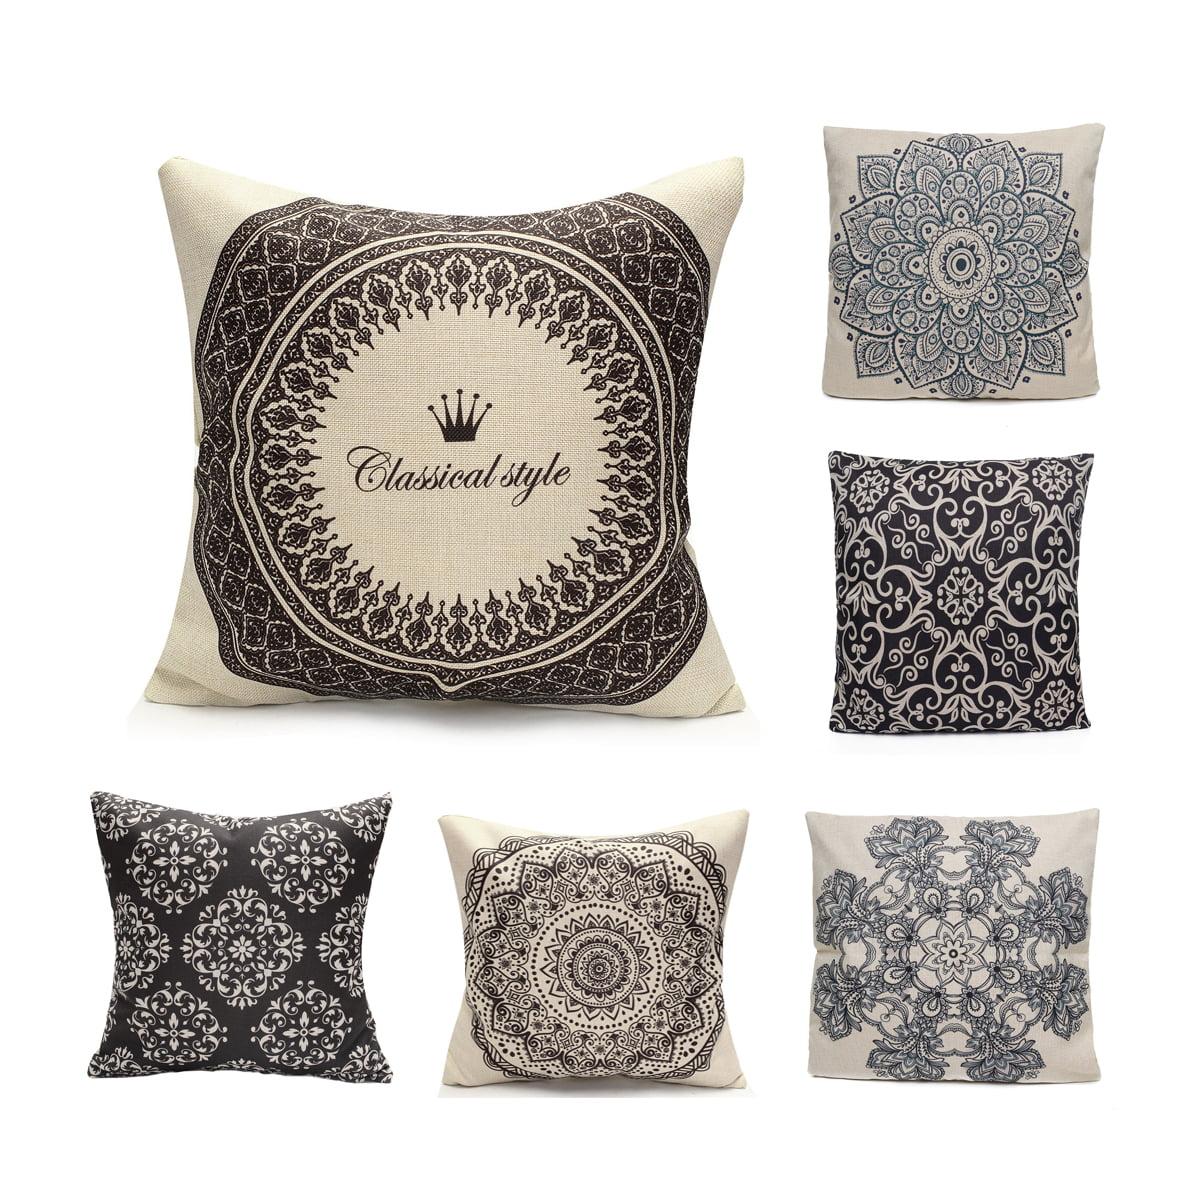 Vintage Geometric Flower Throw Pillow Cushion Cover 18''x18'' Cotton Linen  PillowCase Standard Decorative Pillowslip Pillow Protector Cover Case for  Sofa ...